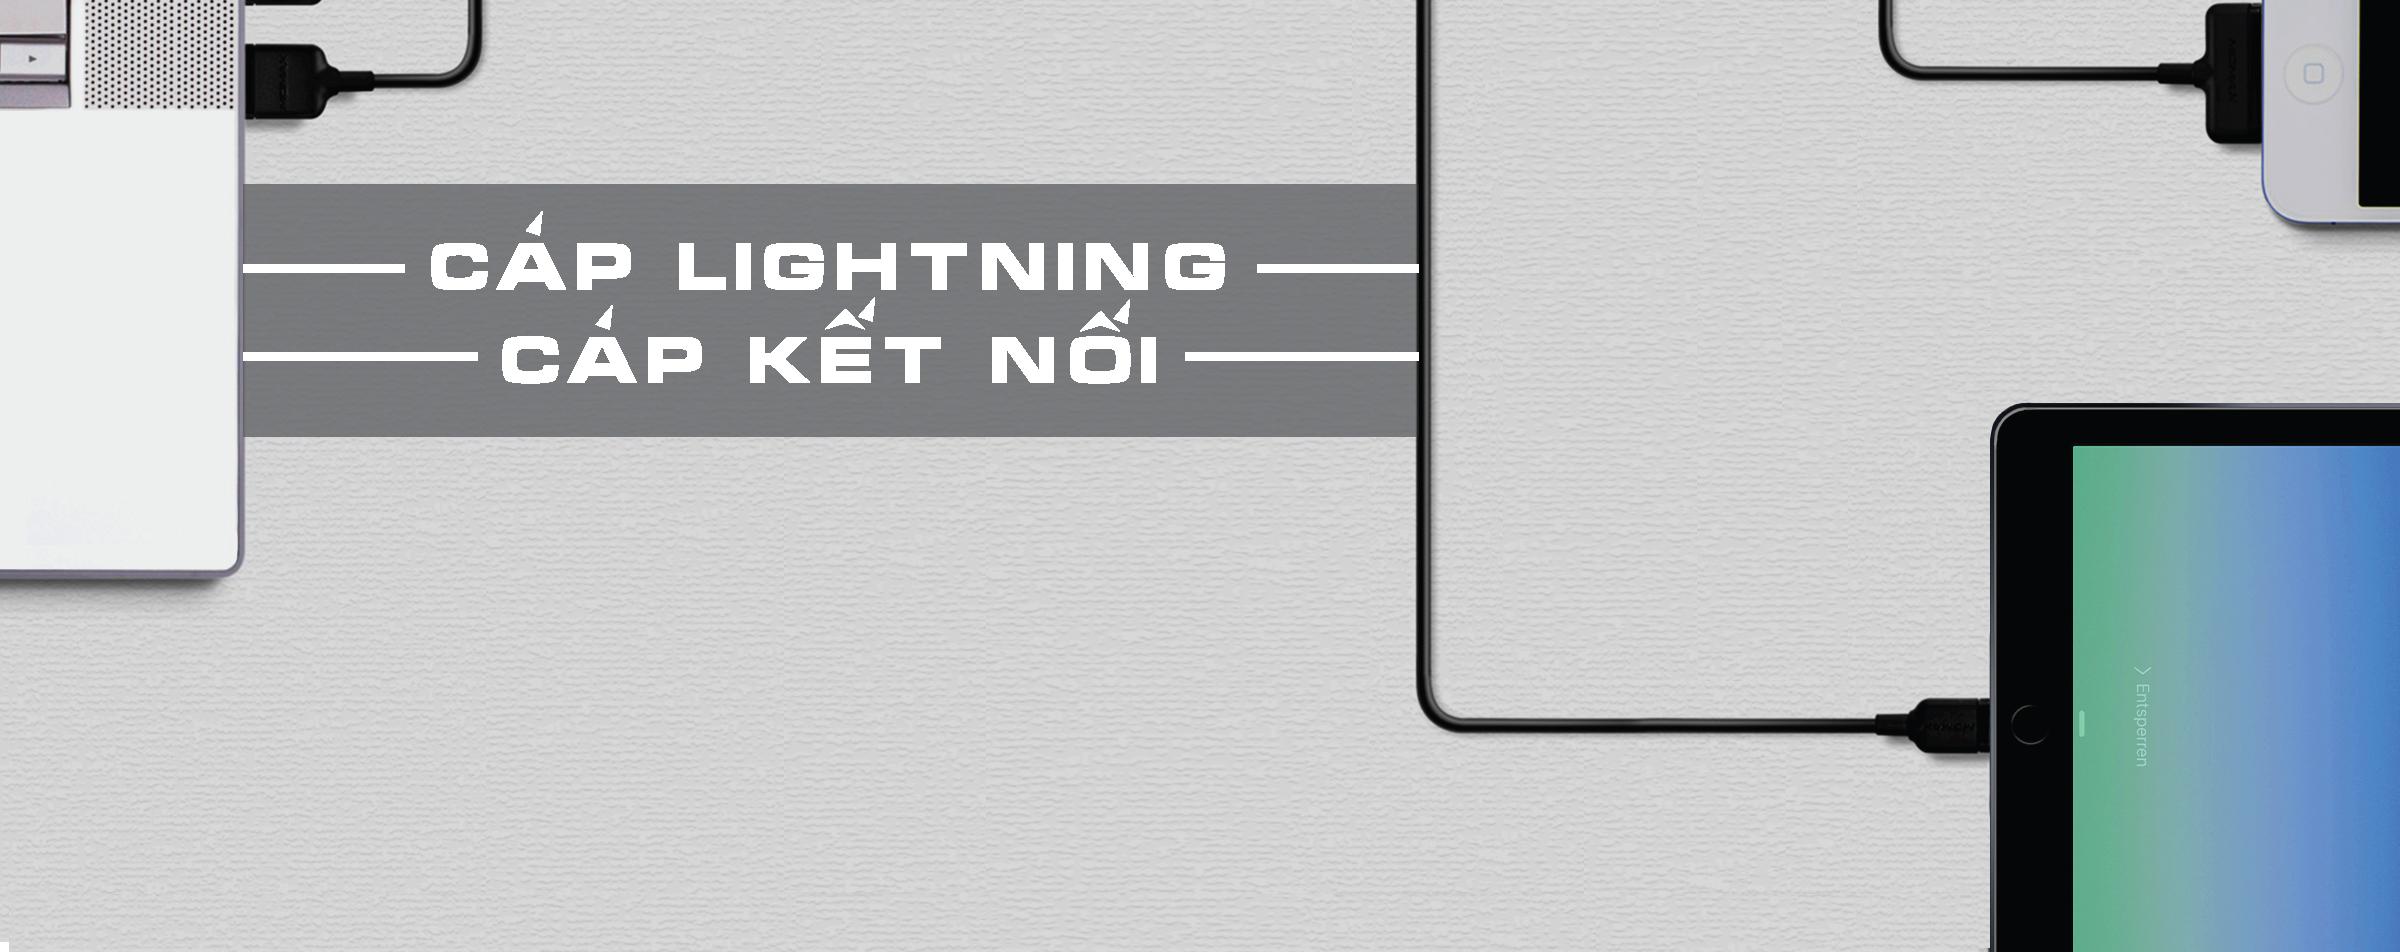 Cáp Lightning - Cáp Kết Nối